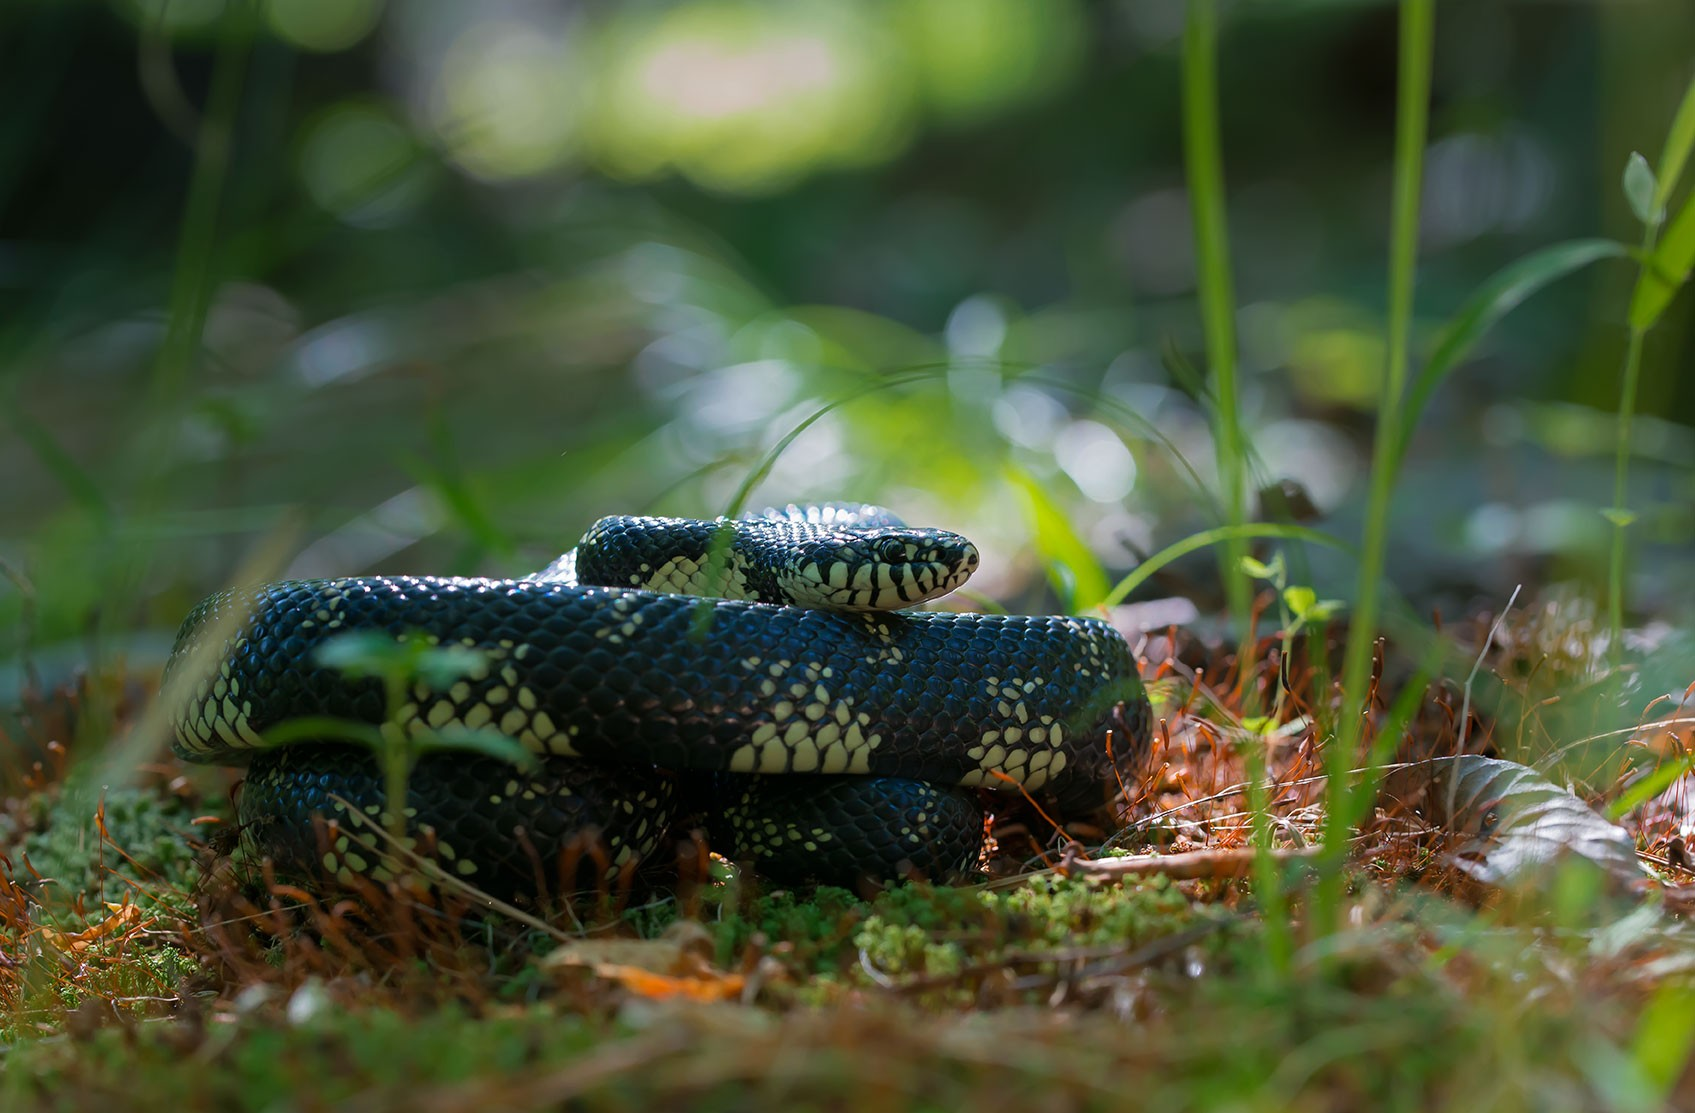 General 1695x1113 photography snake cobra  king plants wildlife reptiles bokeh grass